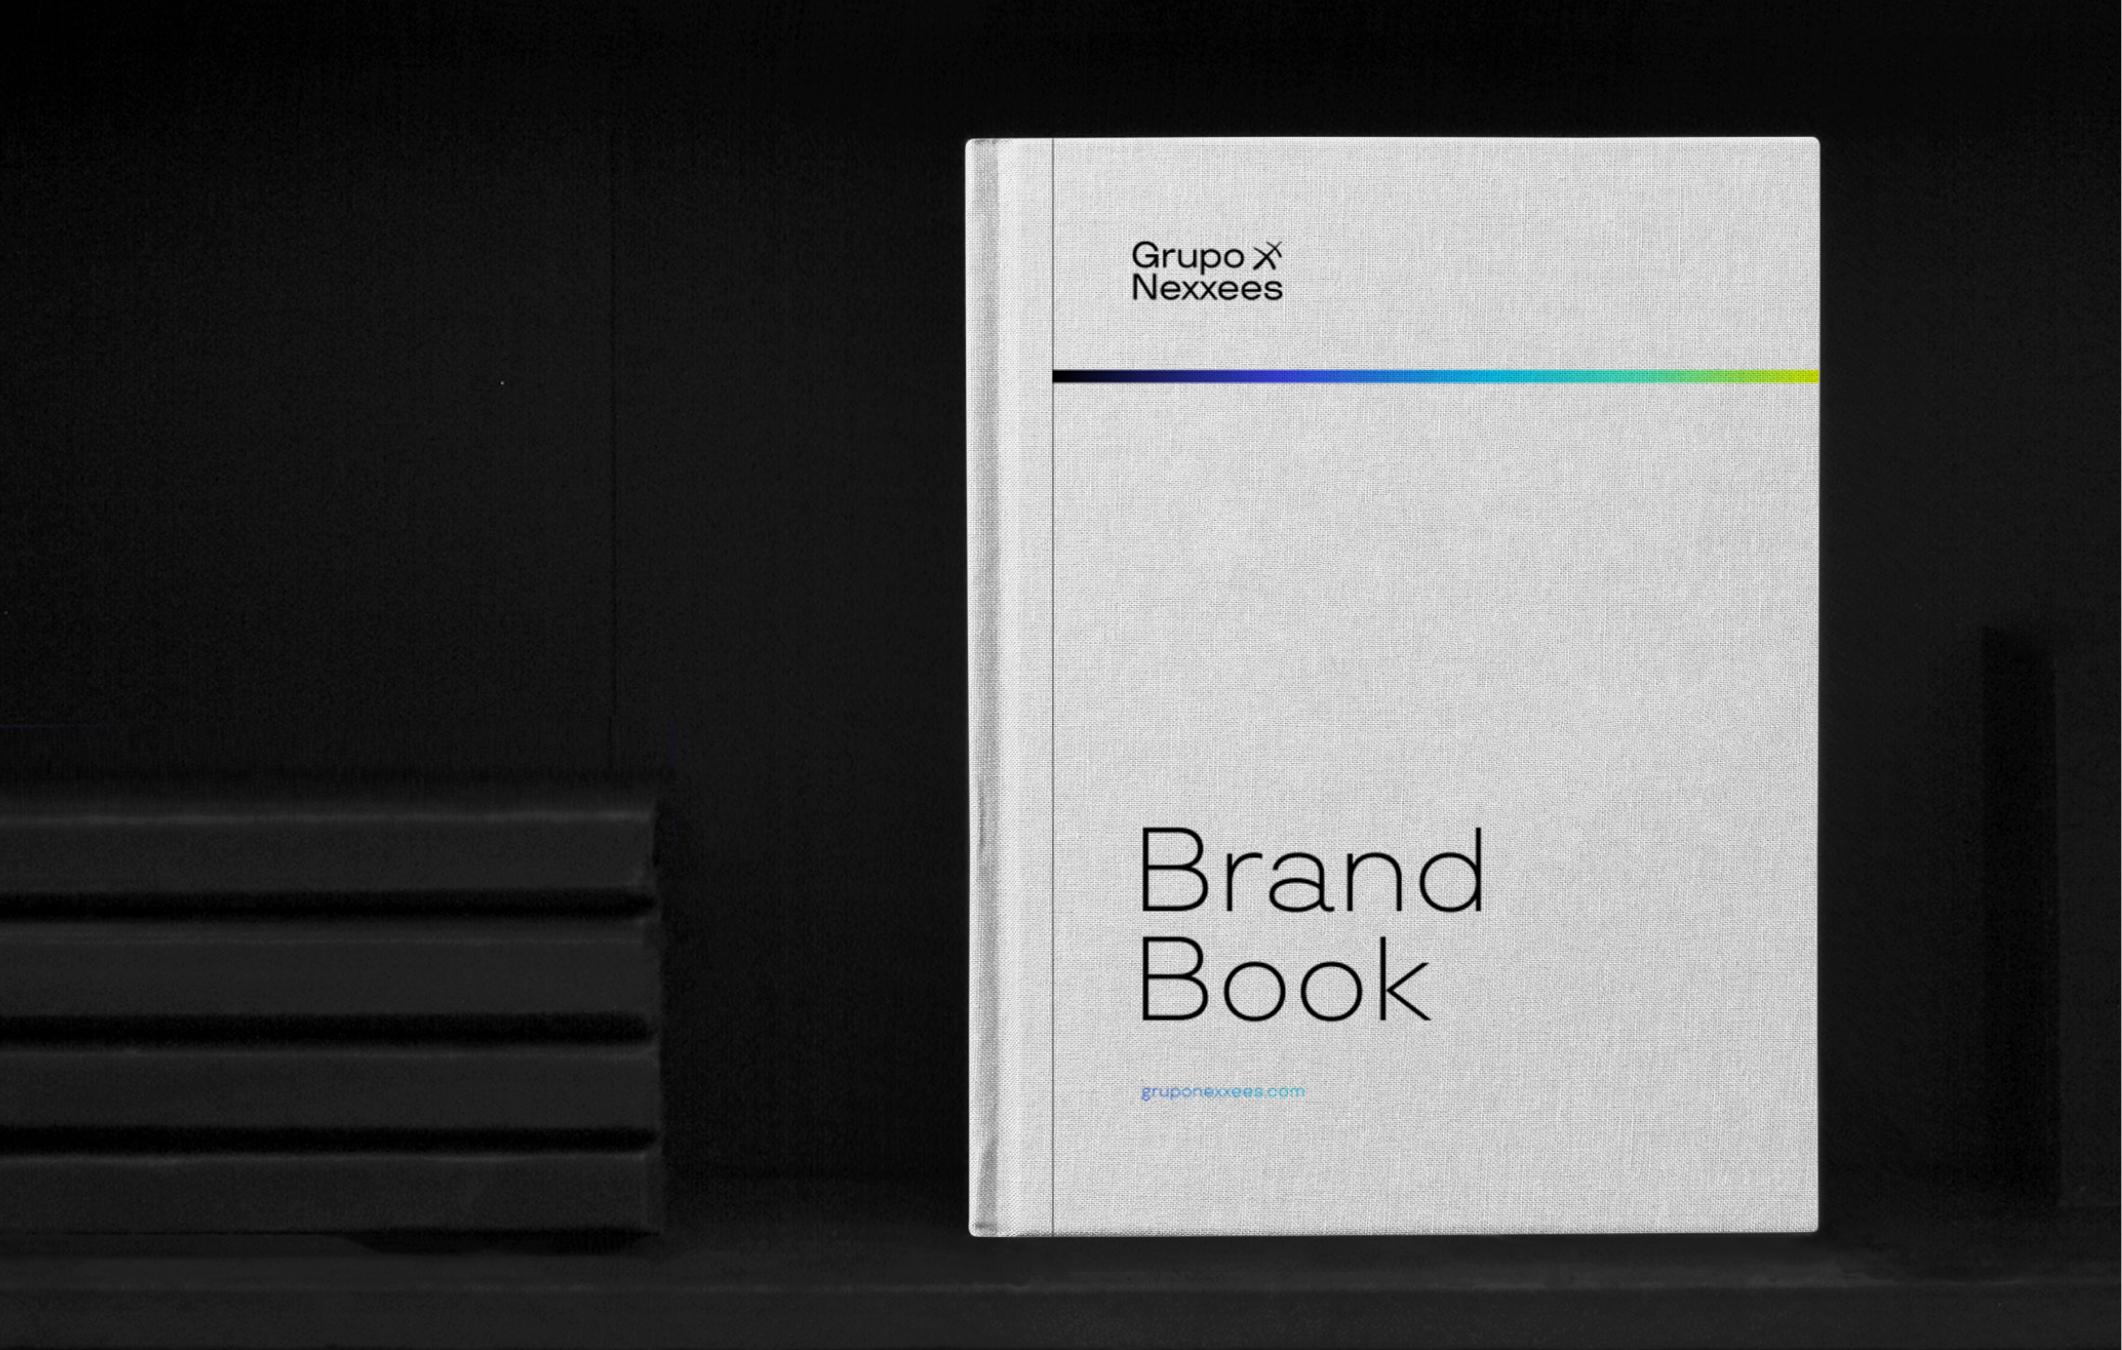 brandbook-1